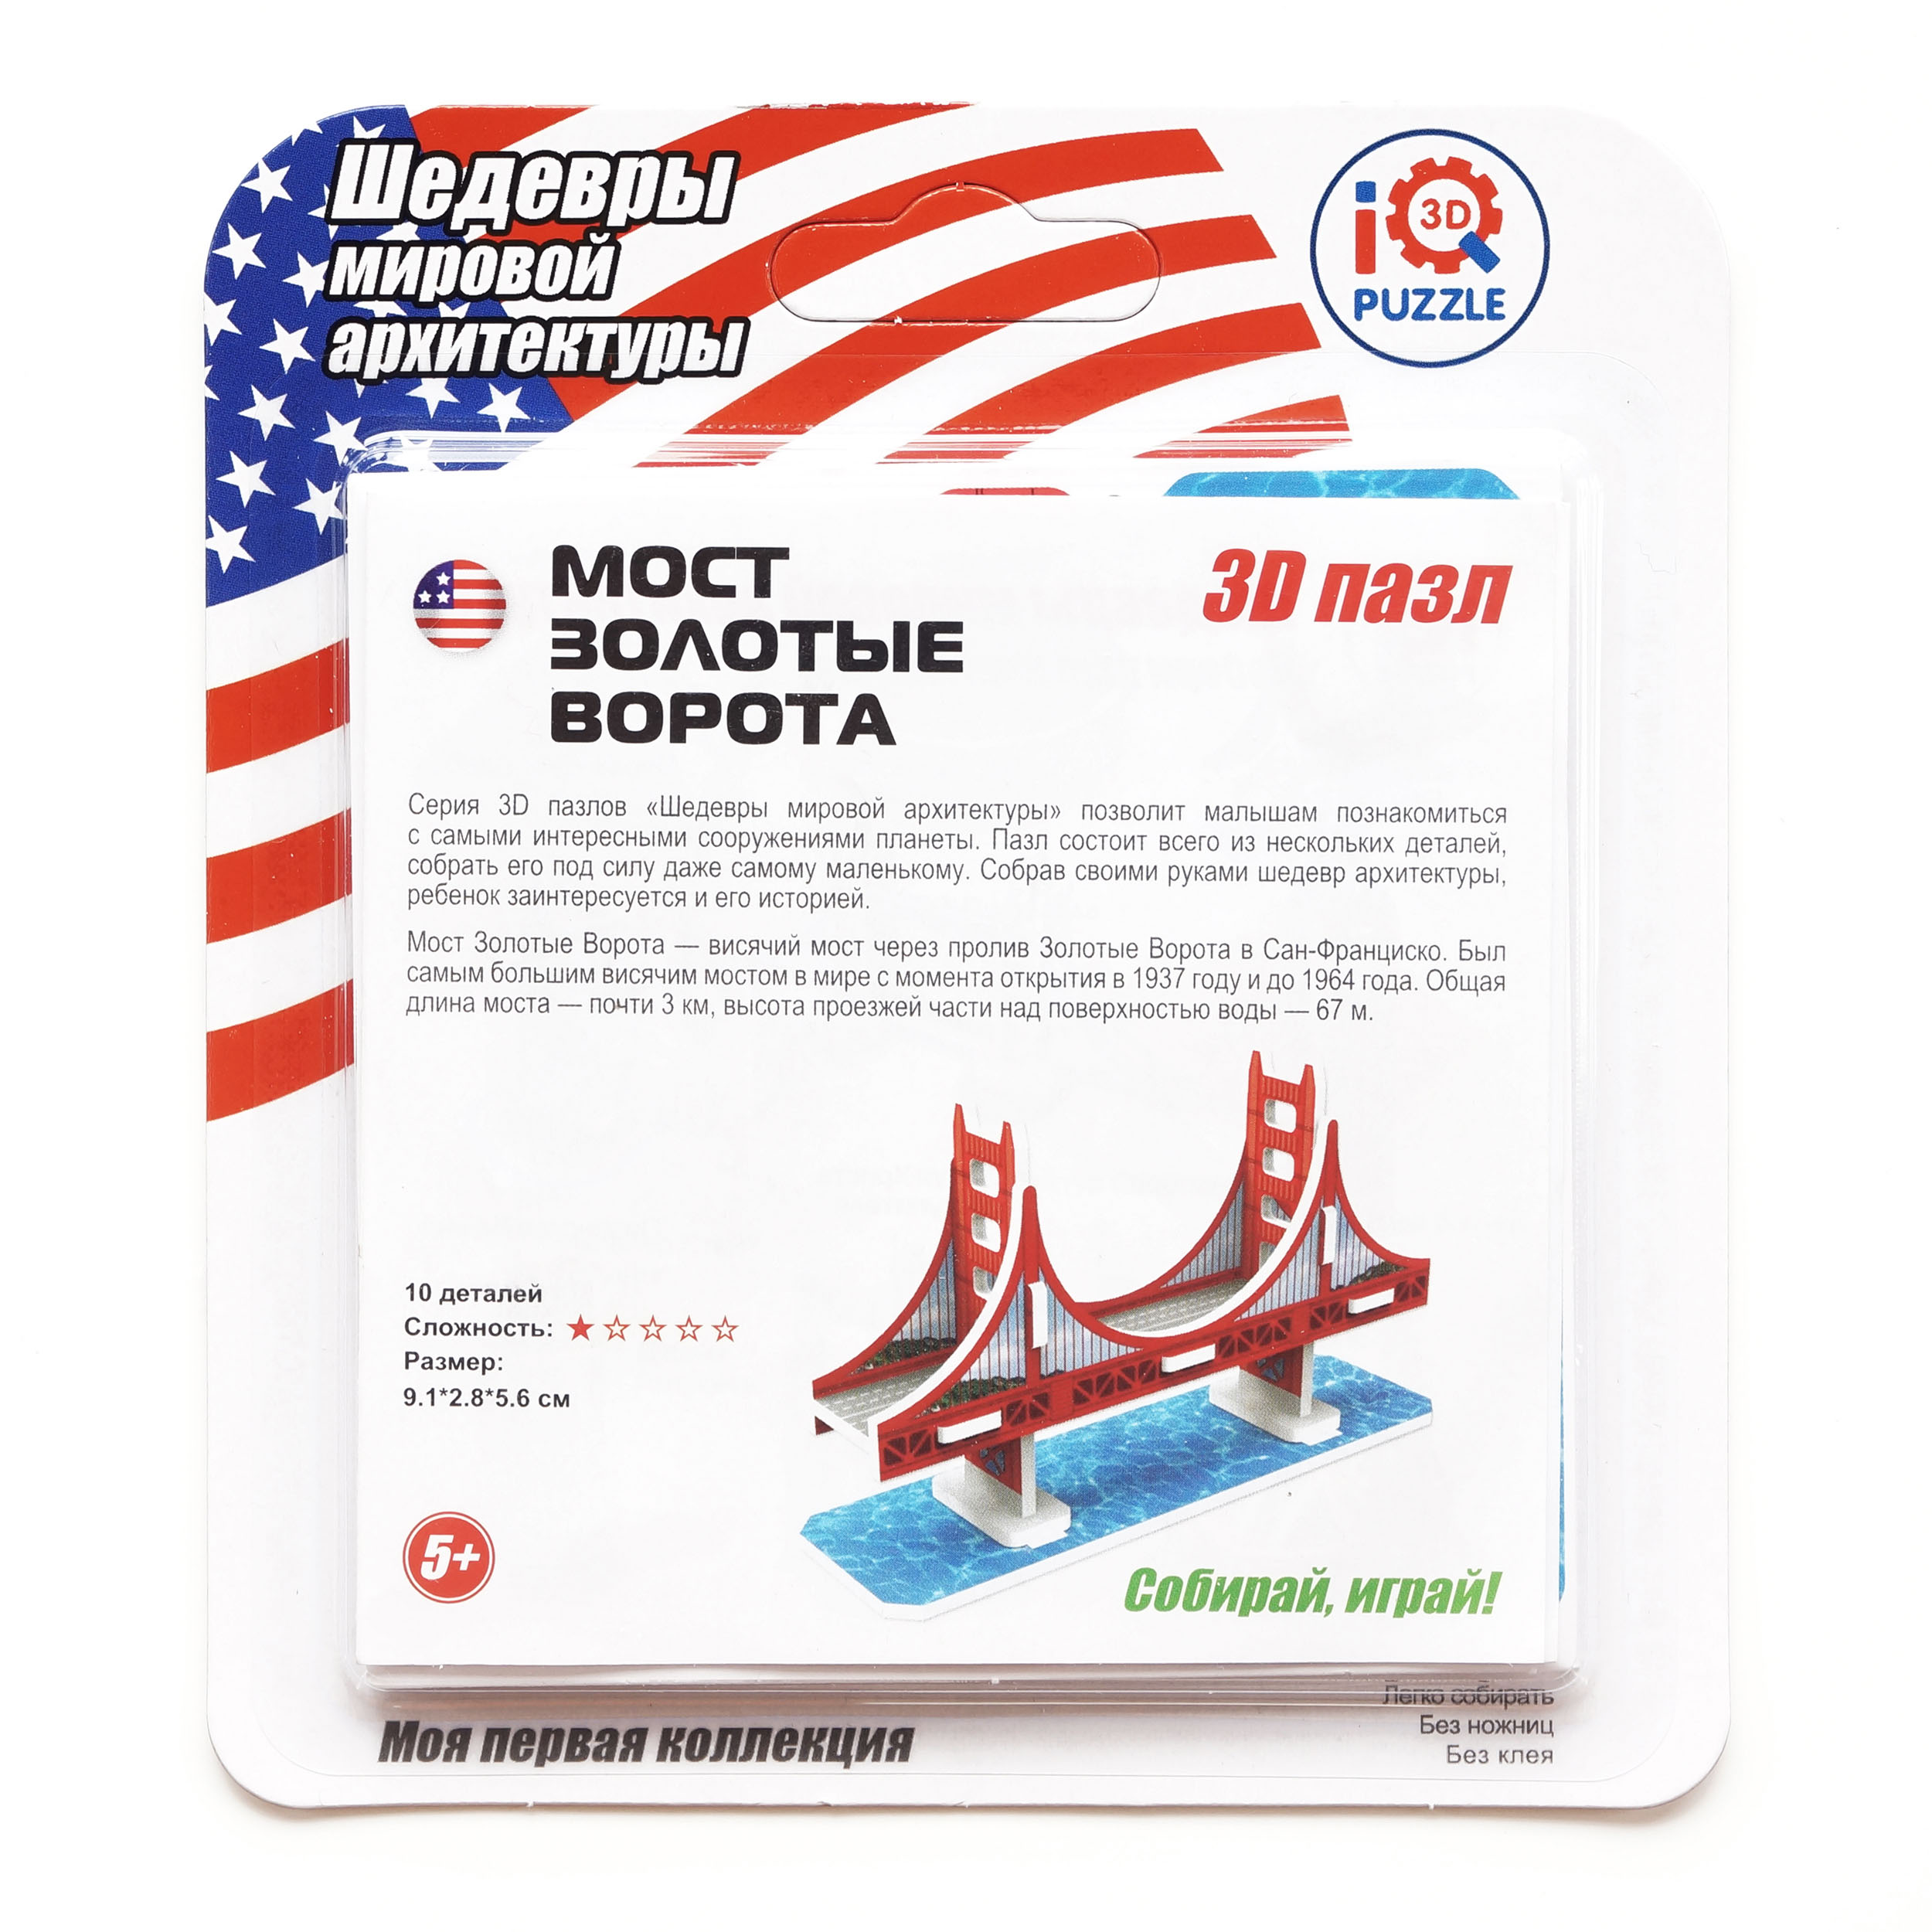 Пазл 3D Мост Золотые Ворота